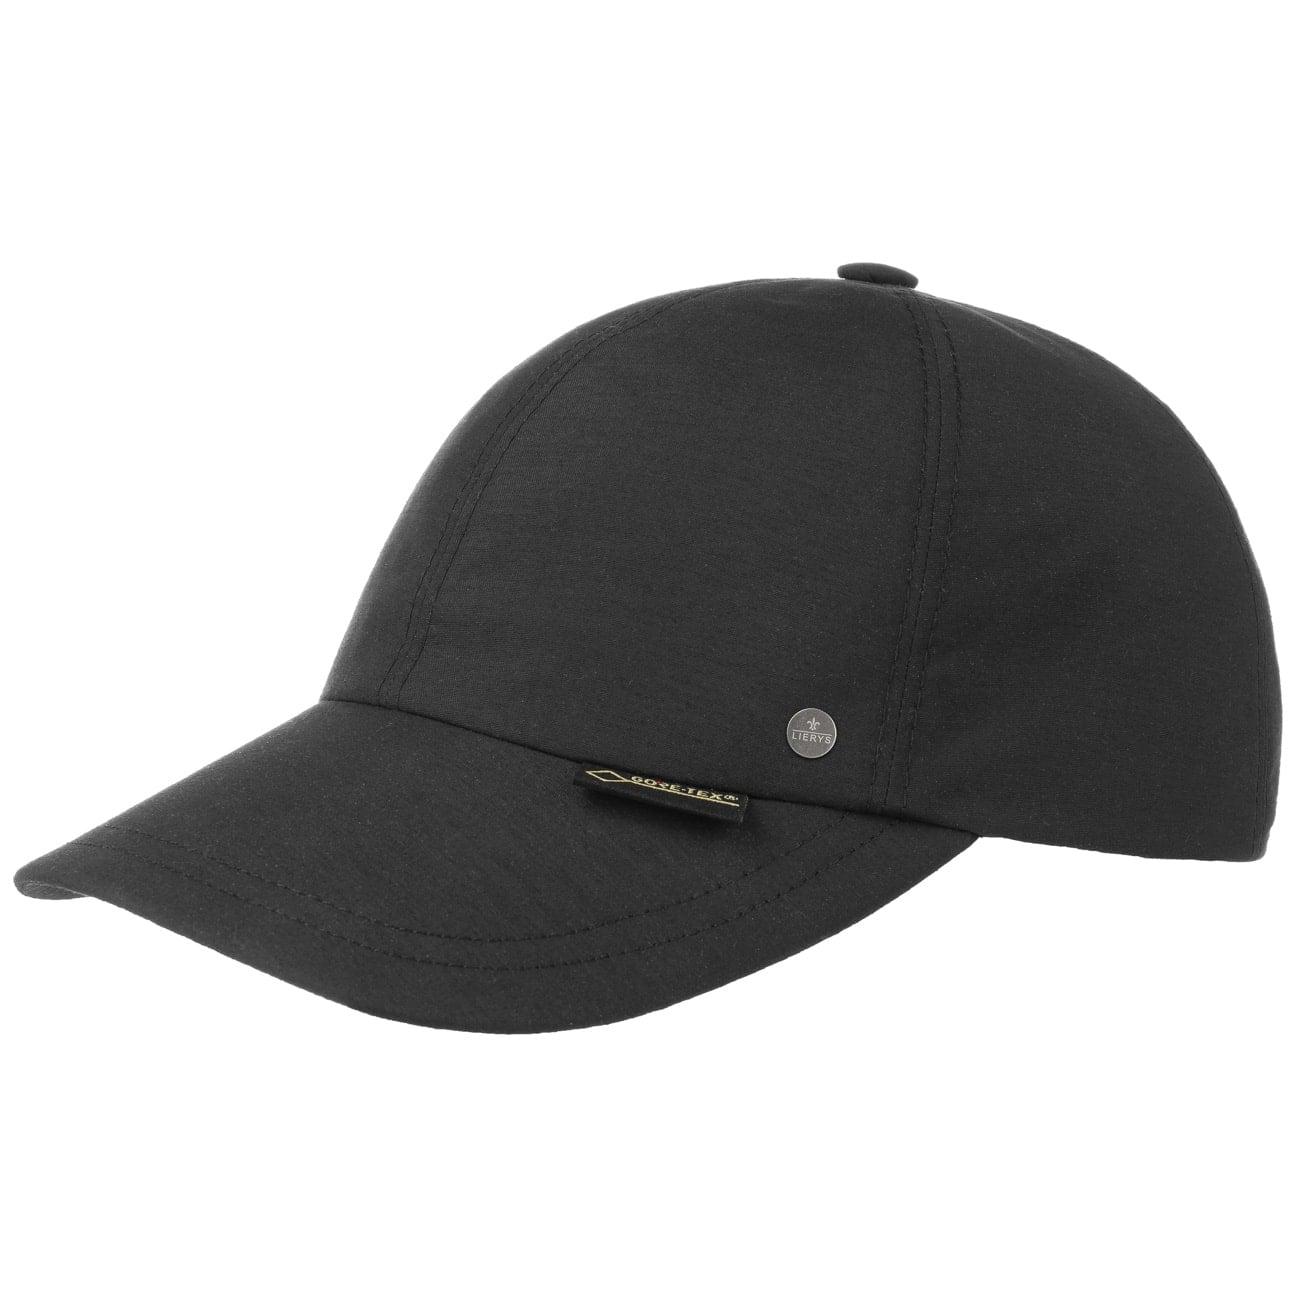 steven-uni-gore-tex-baseballcap-by-lierys-baseballcap